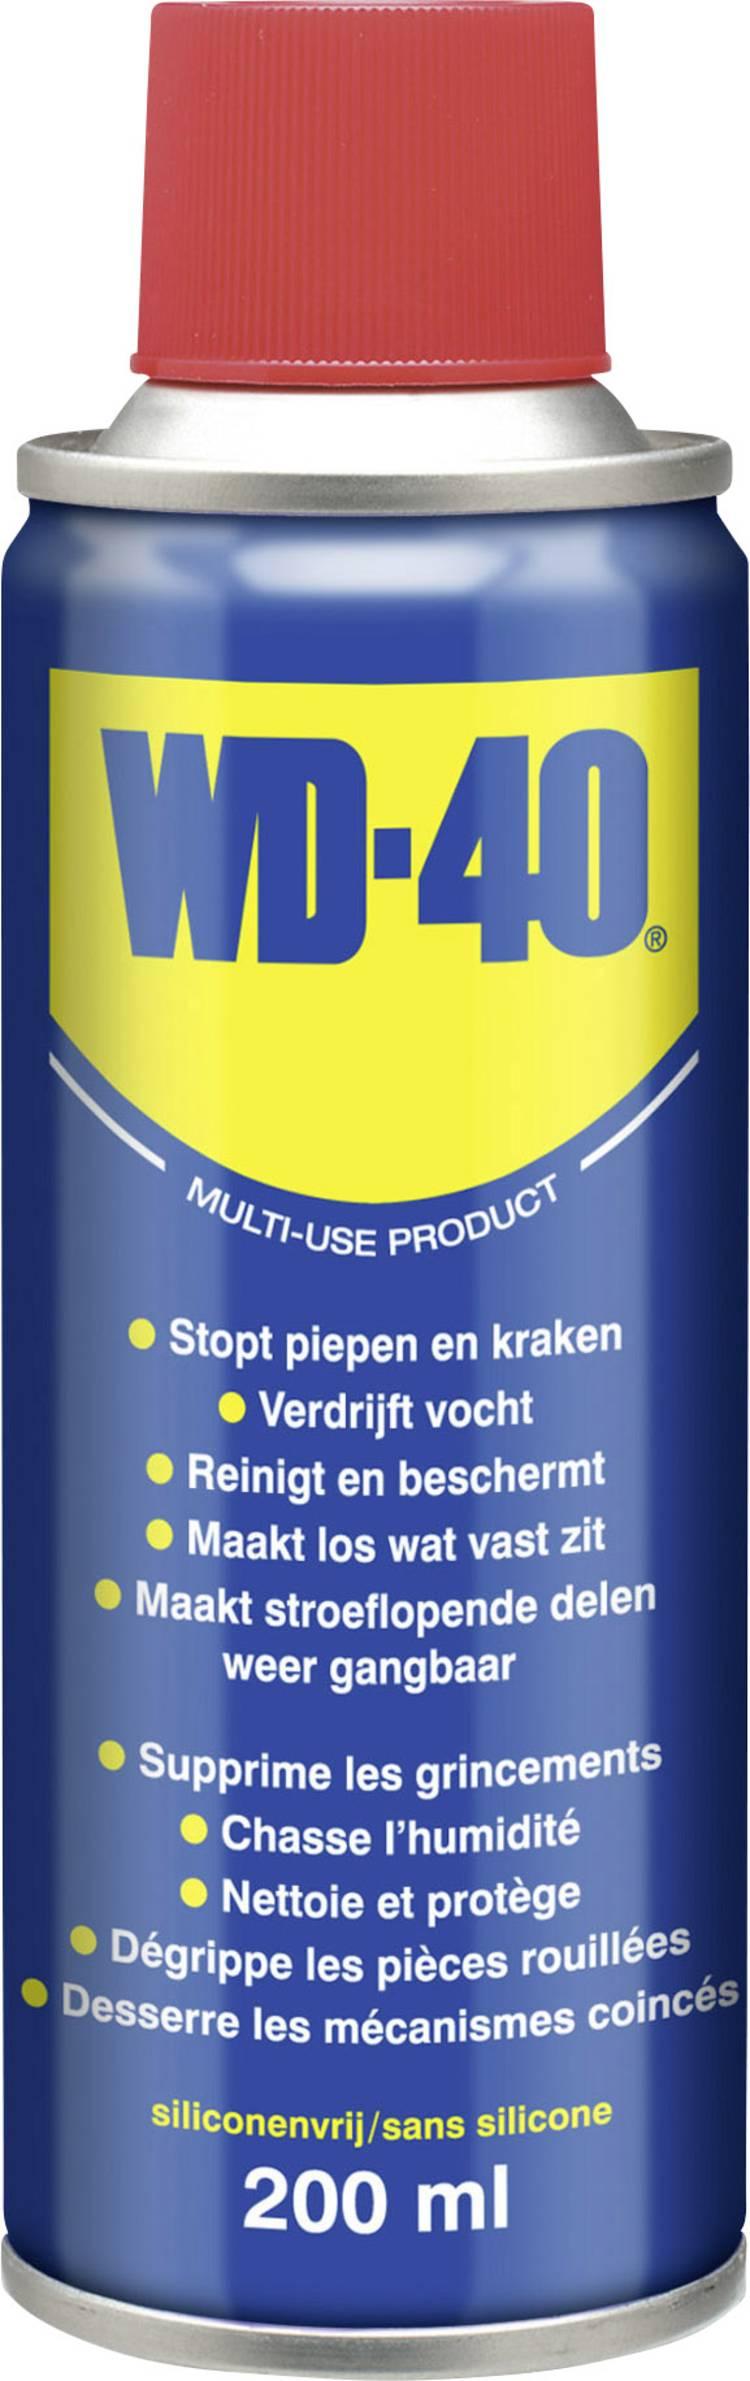 WD-40 Multi-olie 200 ml WD40 Company 0315033